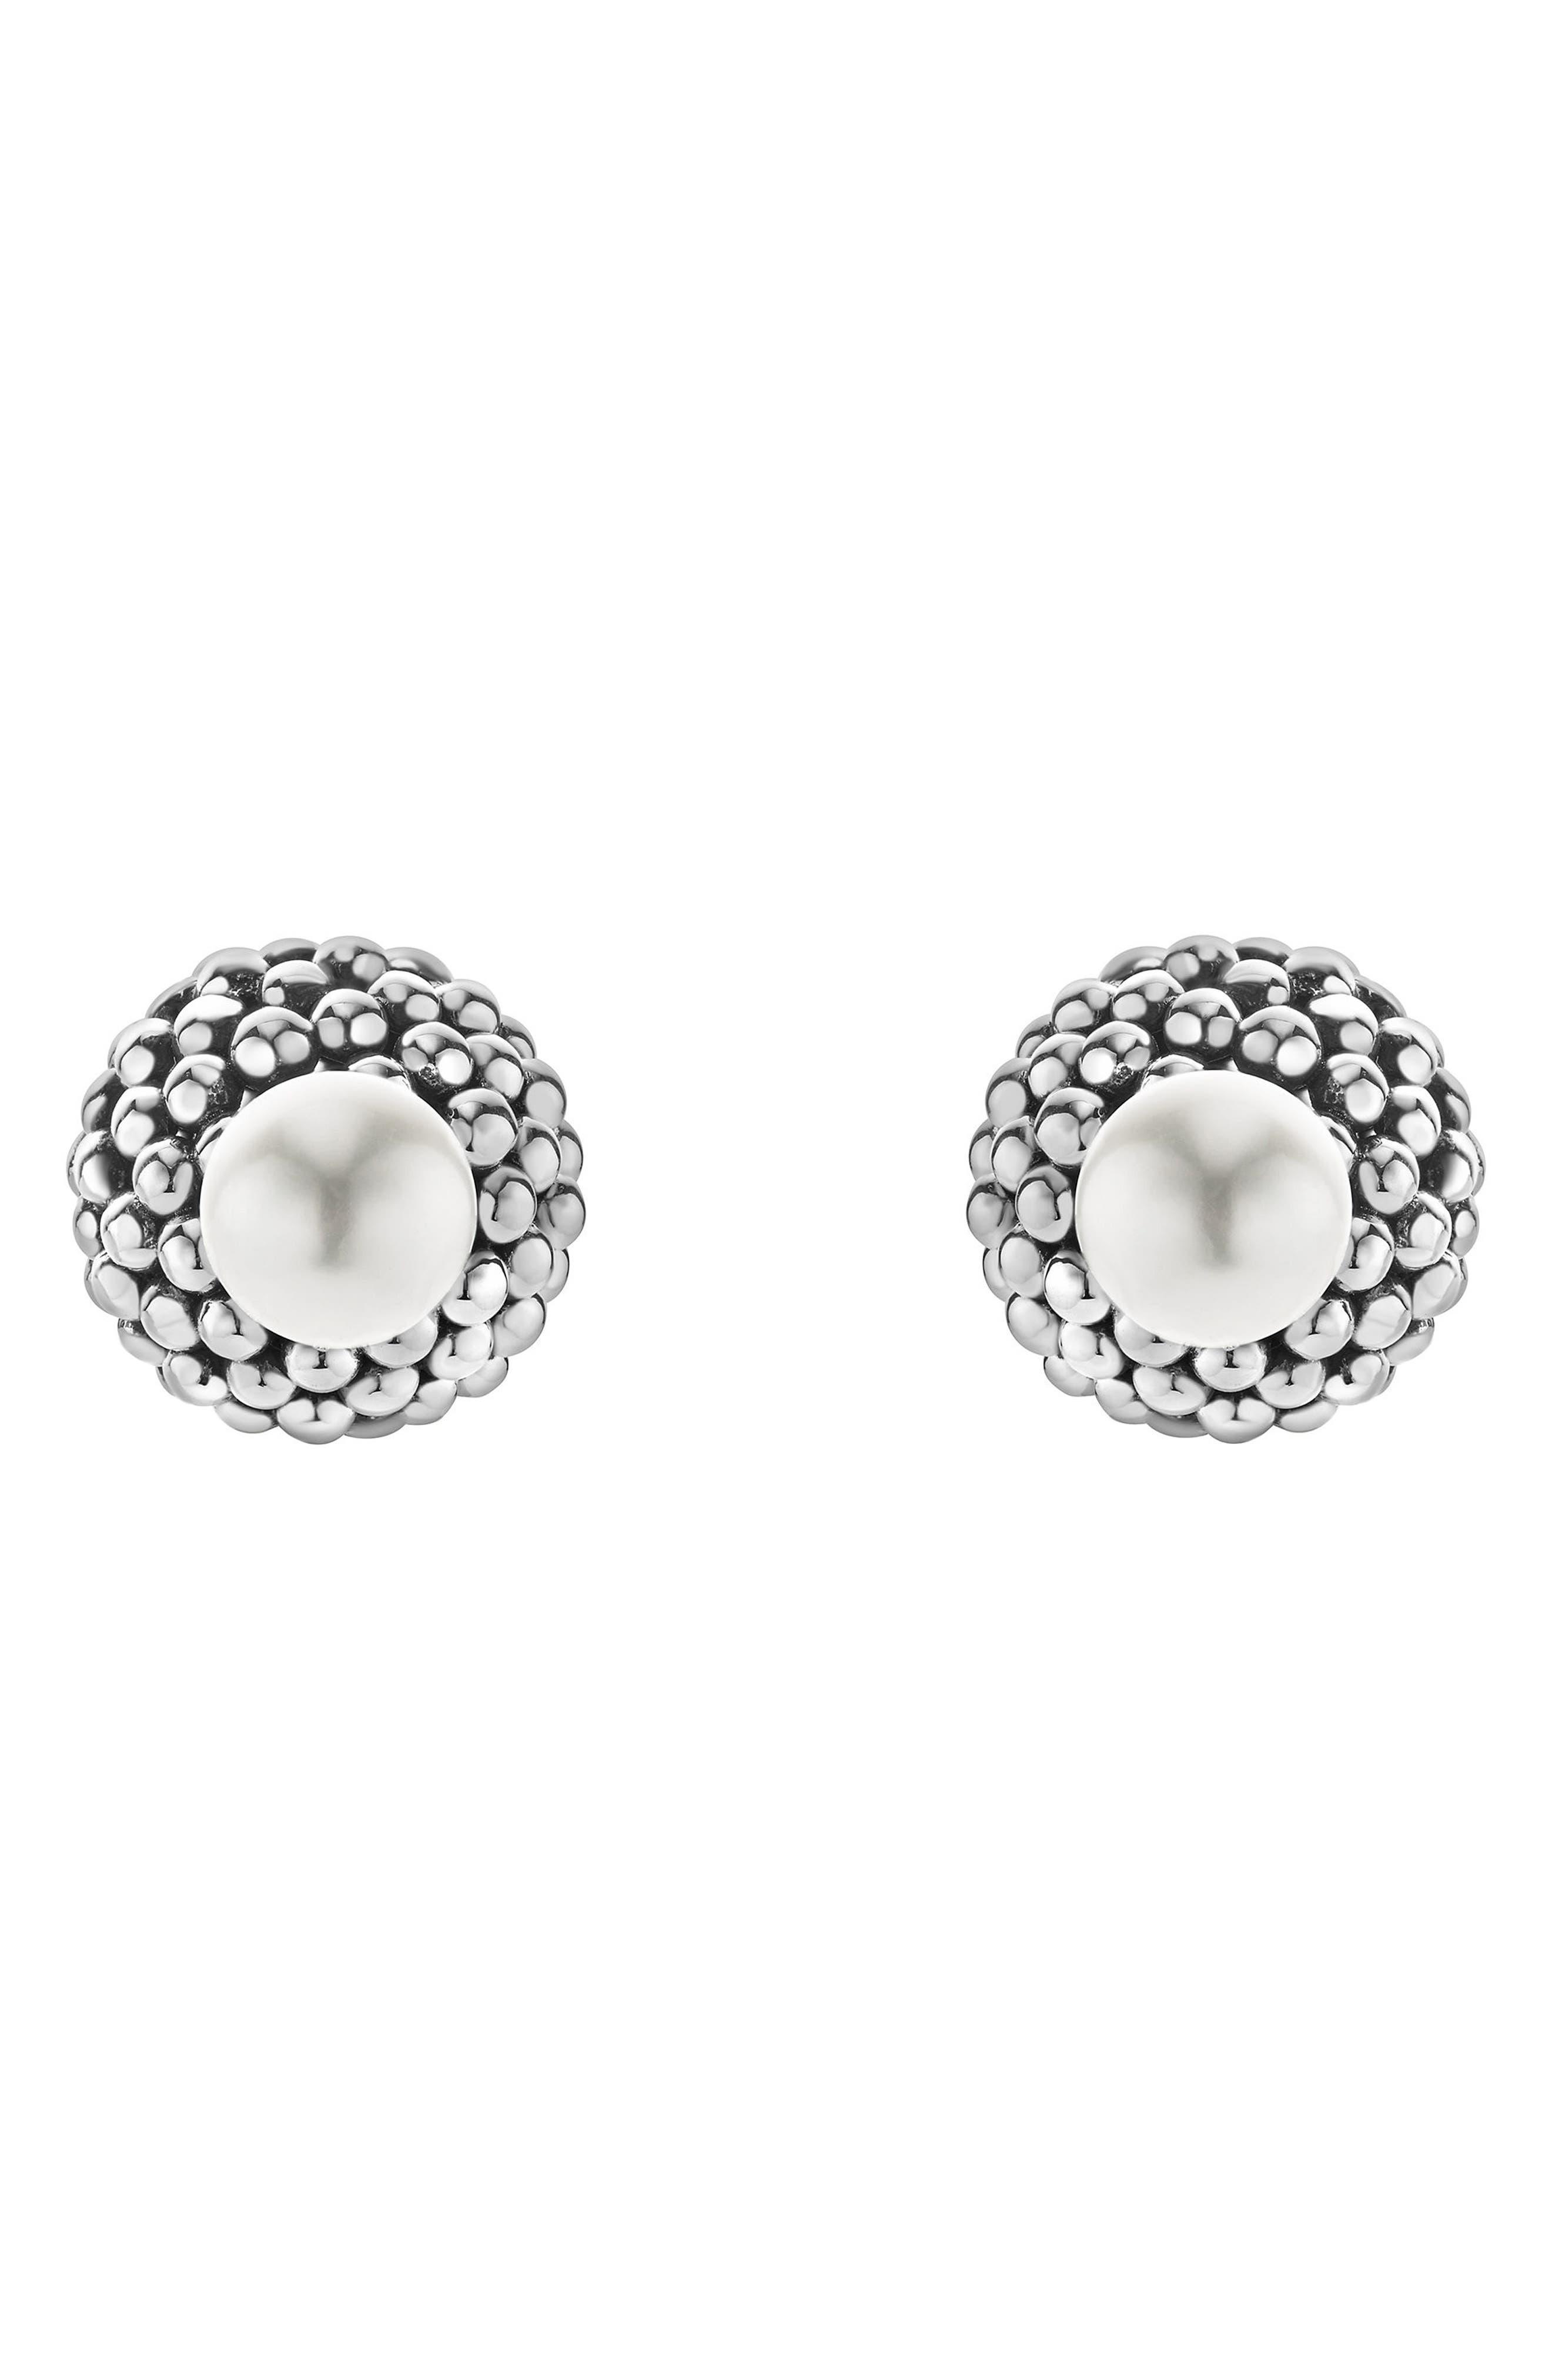 Caviar & Pearl Stud Earrings,                         Main,                         color, Pearl